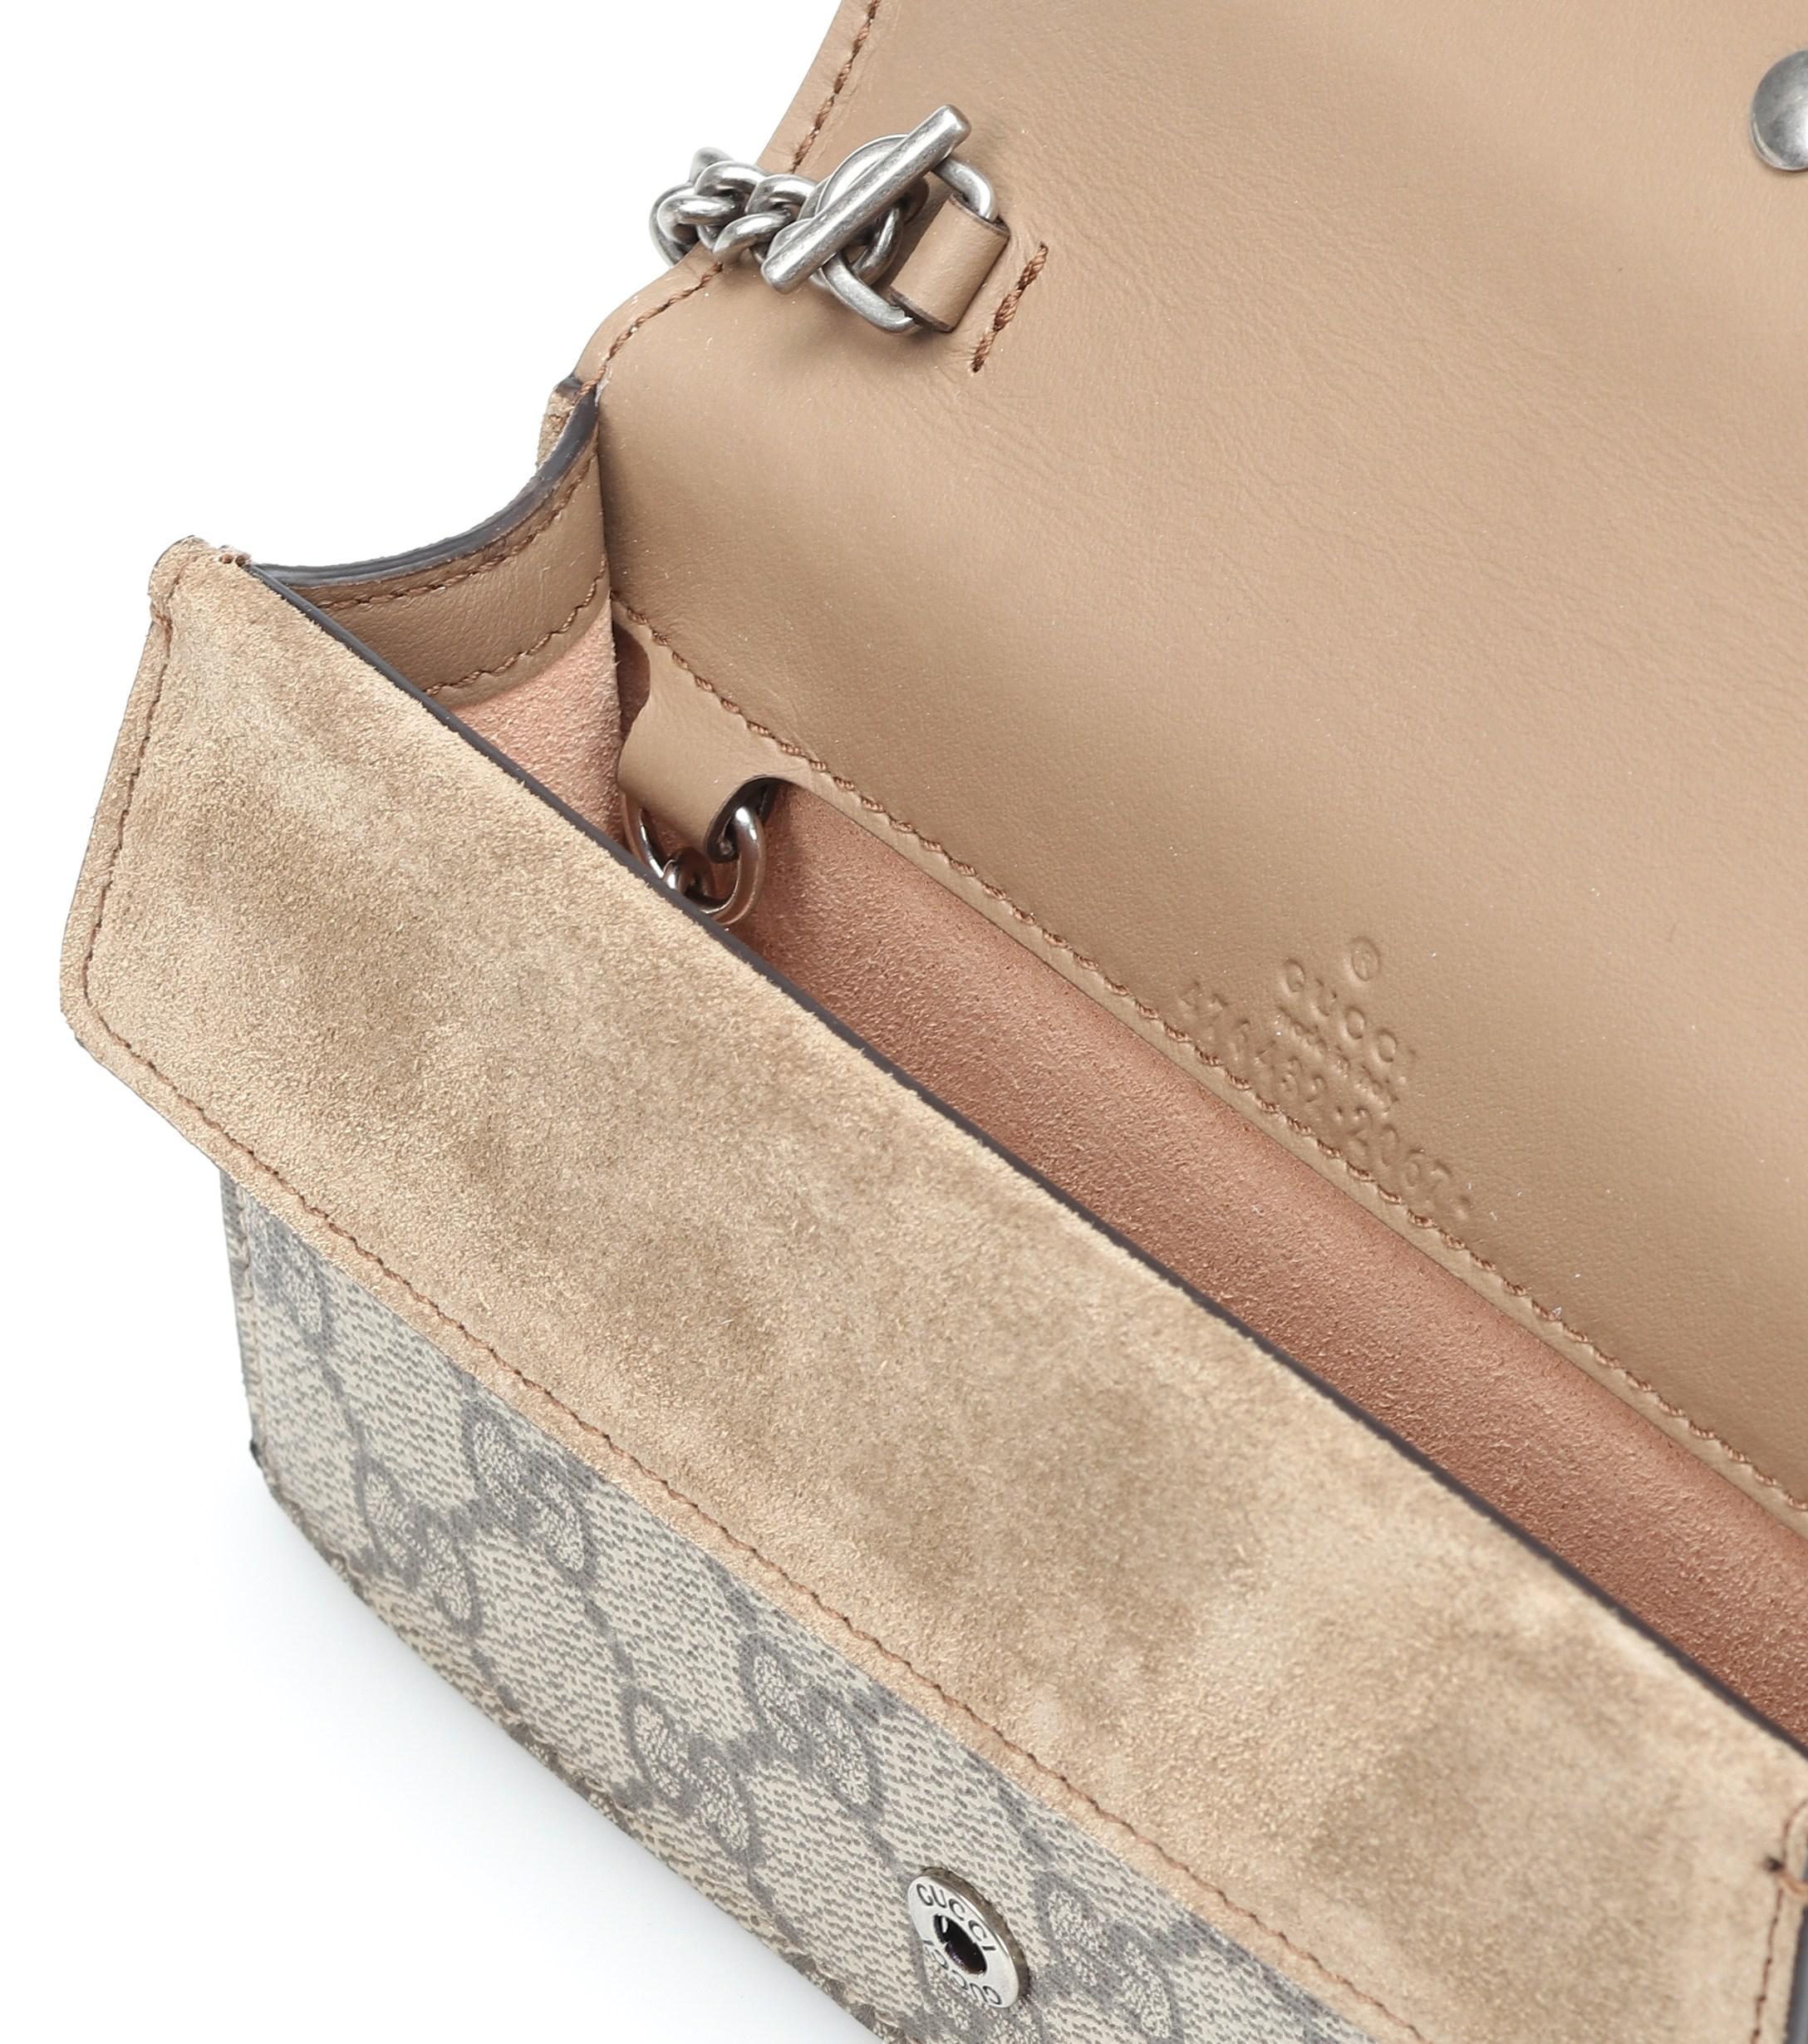 6f1baf82d Gucci Dionysus GG Supreme Super Mini Shoulder Bag in Natural - Lyst